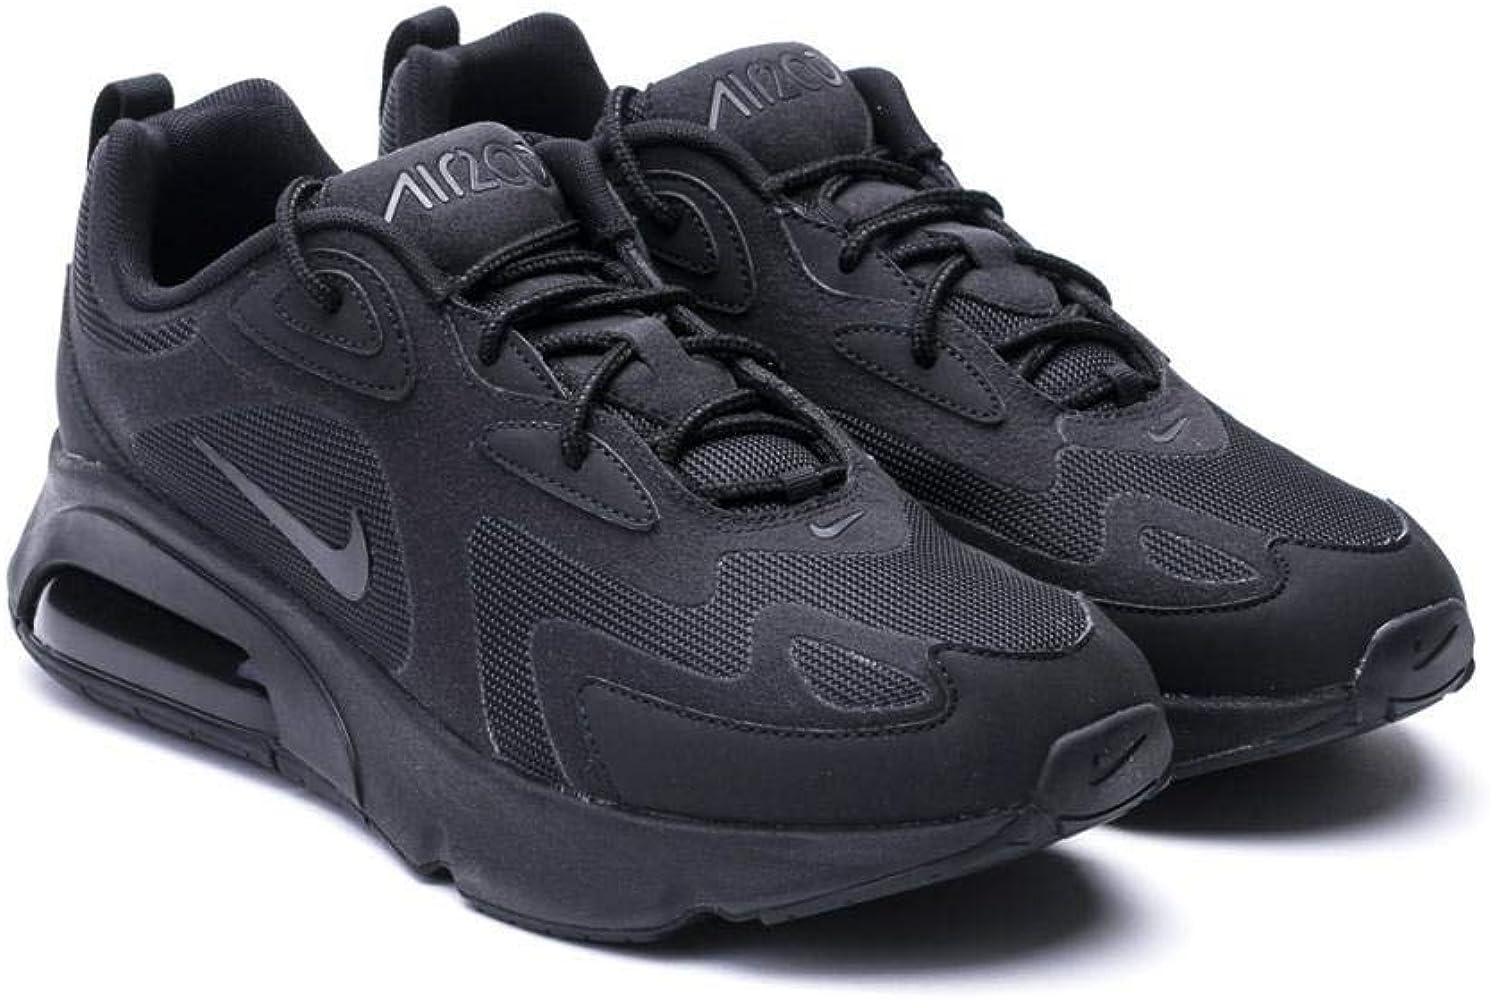 Nike Air Max 200 Men's Shoe, Scarpe da Corsa Uomo, Black